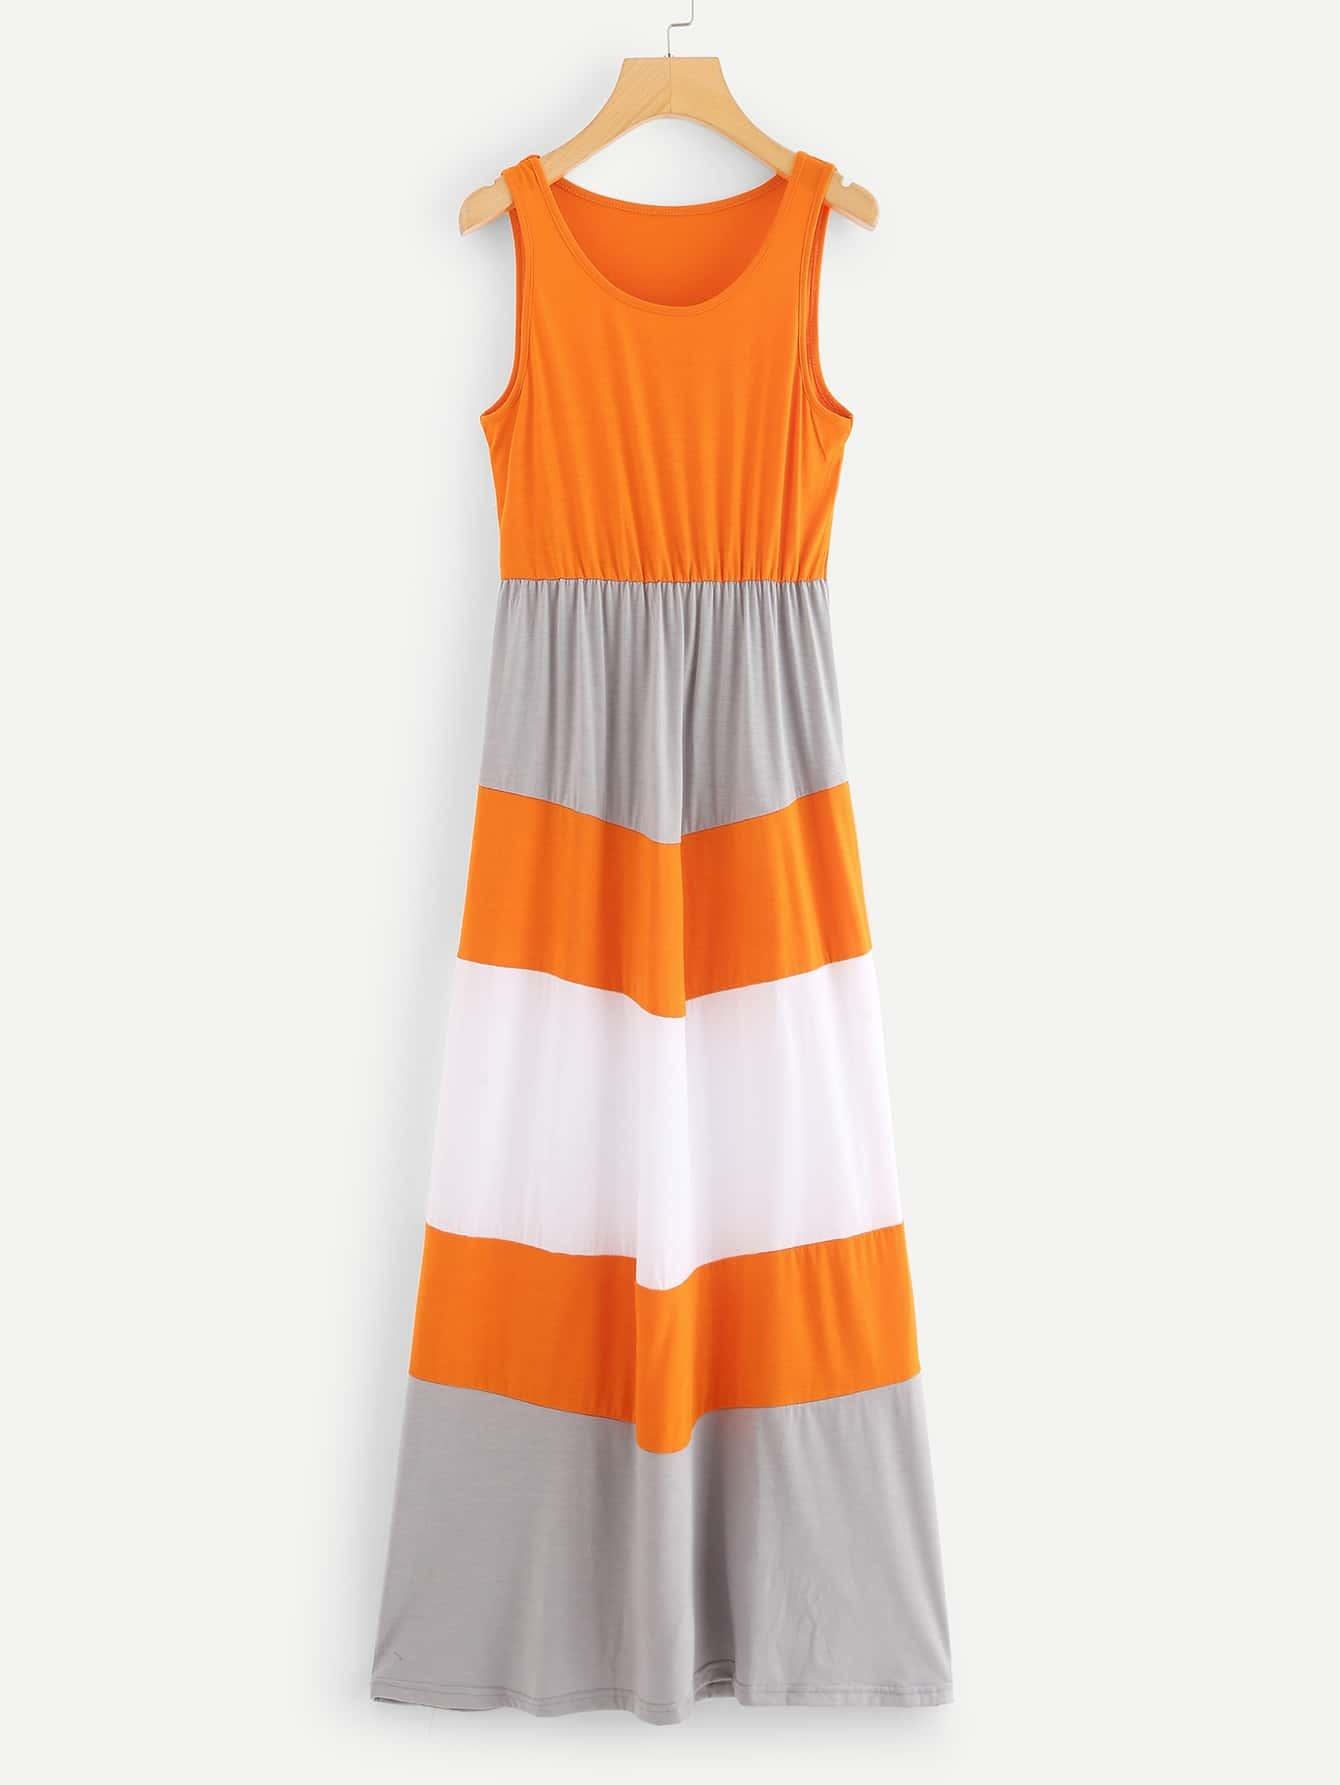 Contrast Panel Colorblock Dress kids contrast panel sleeveless dress